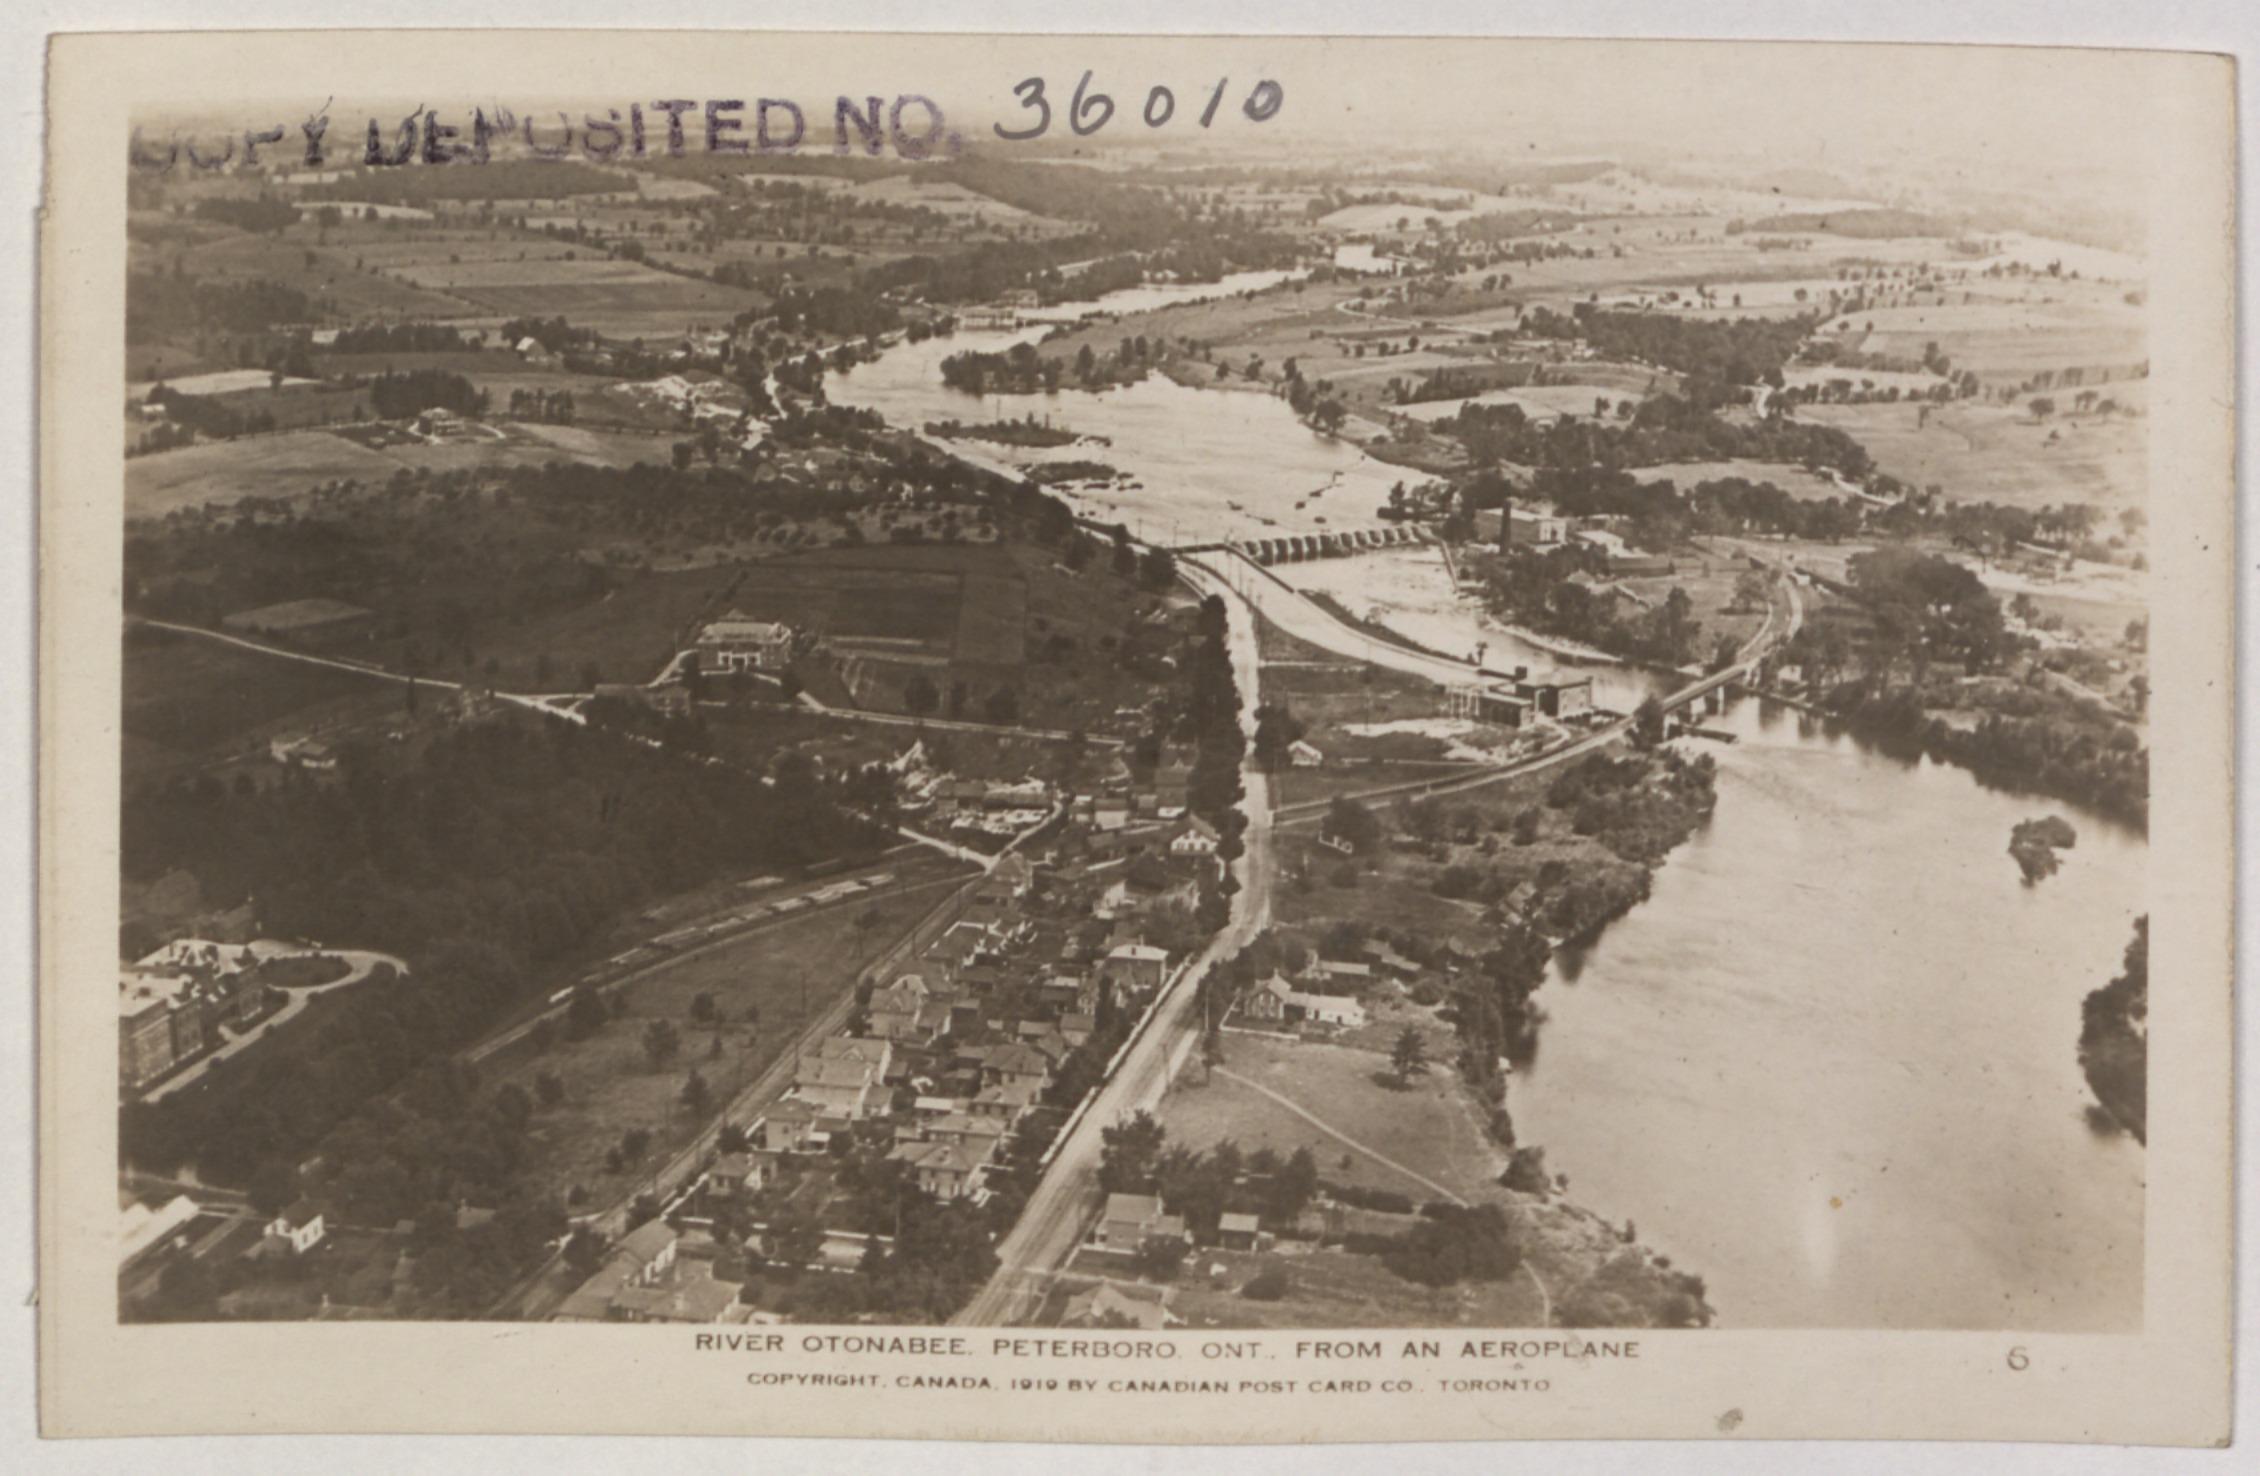 peterboro dating 7th annual peterboro emancipation days saturday & sunday, august 6 & 7, 2016 gerrit smith estate national historic landmark 5304 oxbow road po box 6.